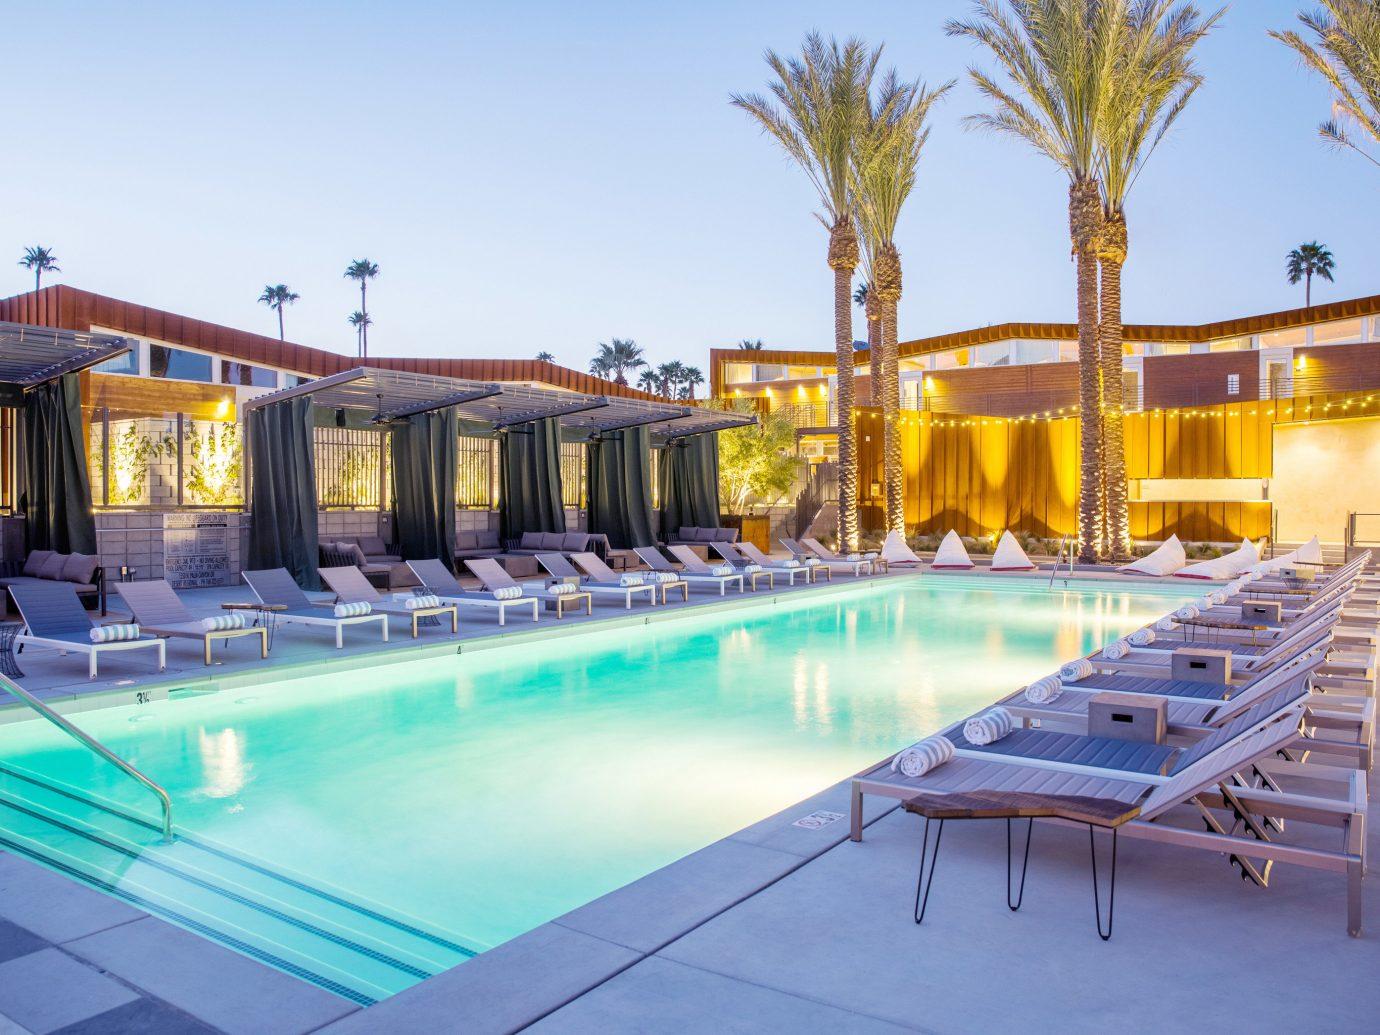 sky ground swimming pool property leisure Resort Villa condominium palace resort town blue mansion hacienda